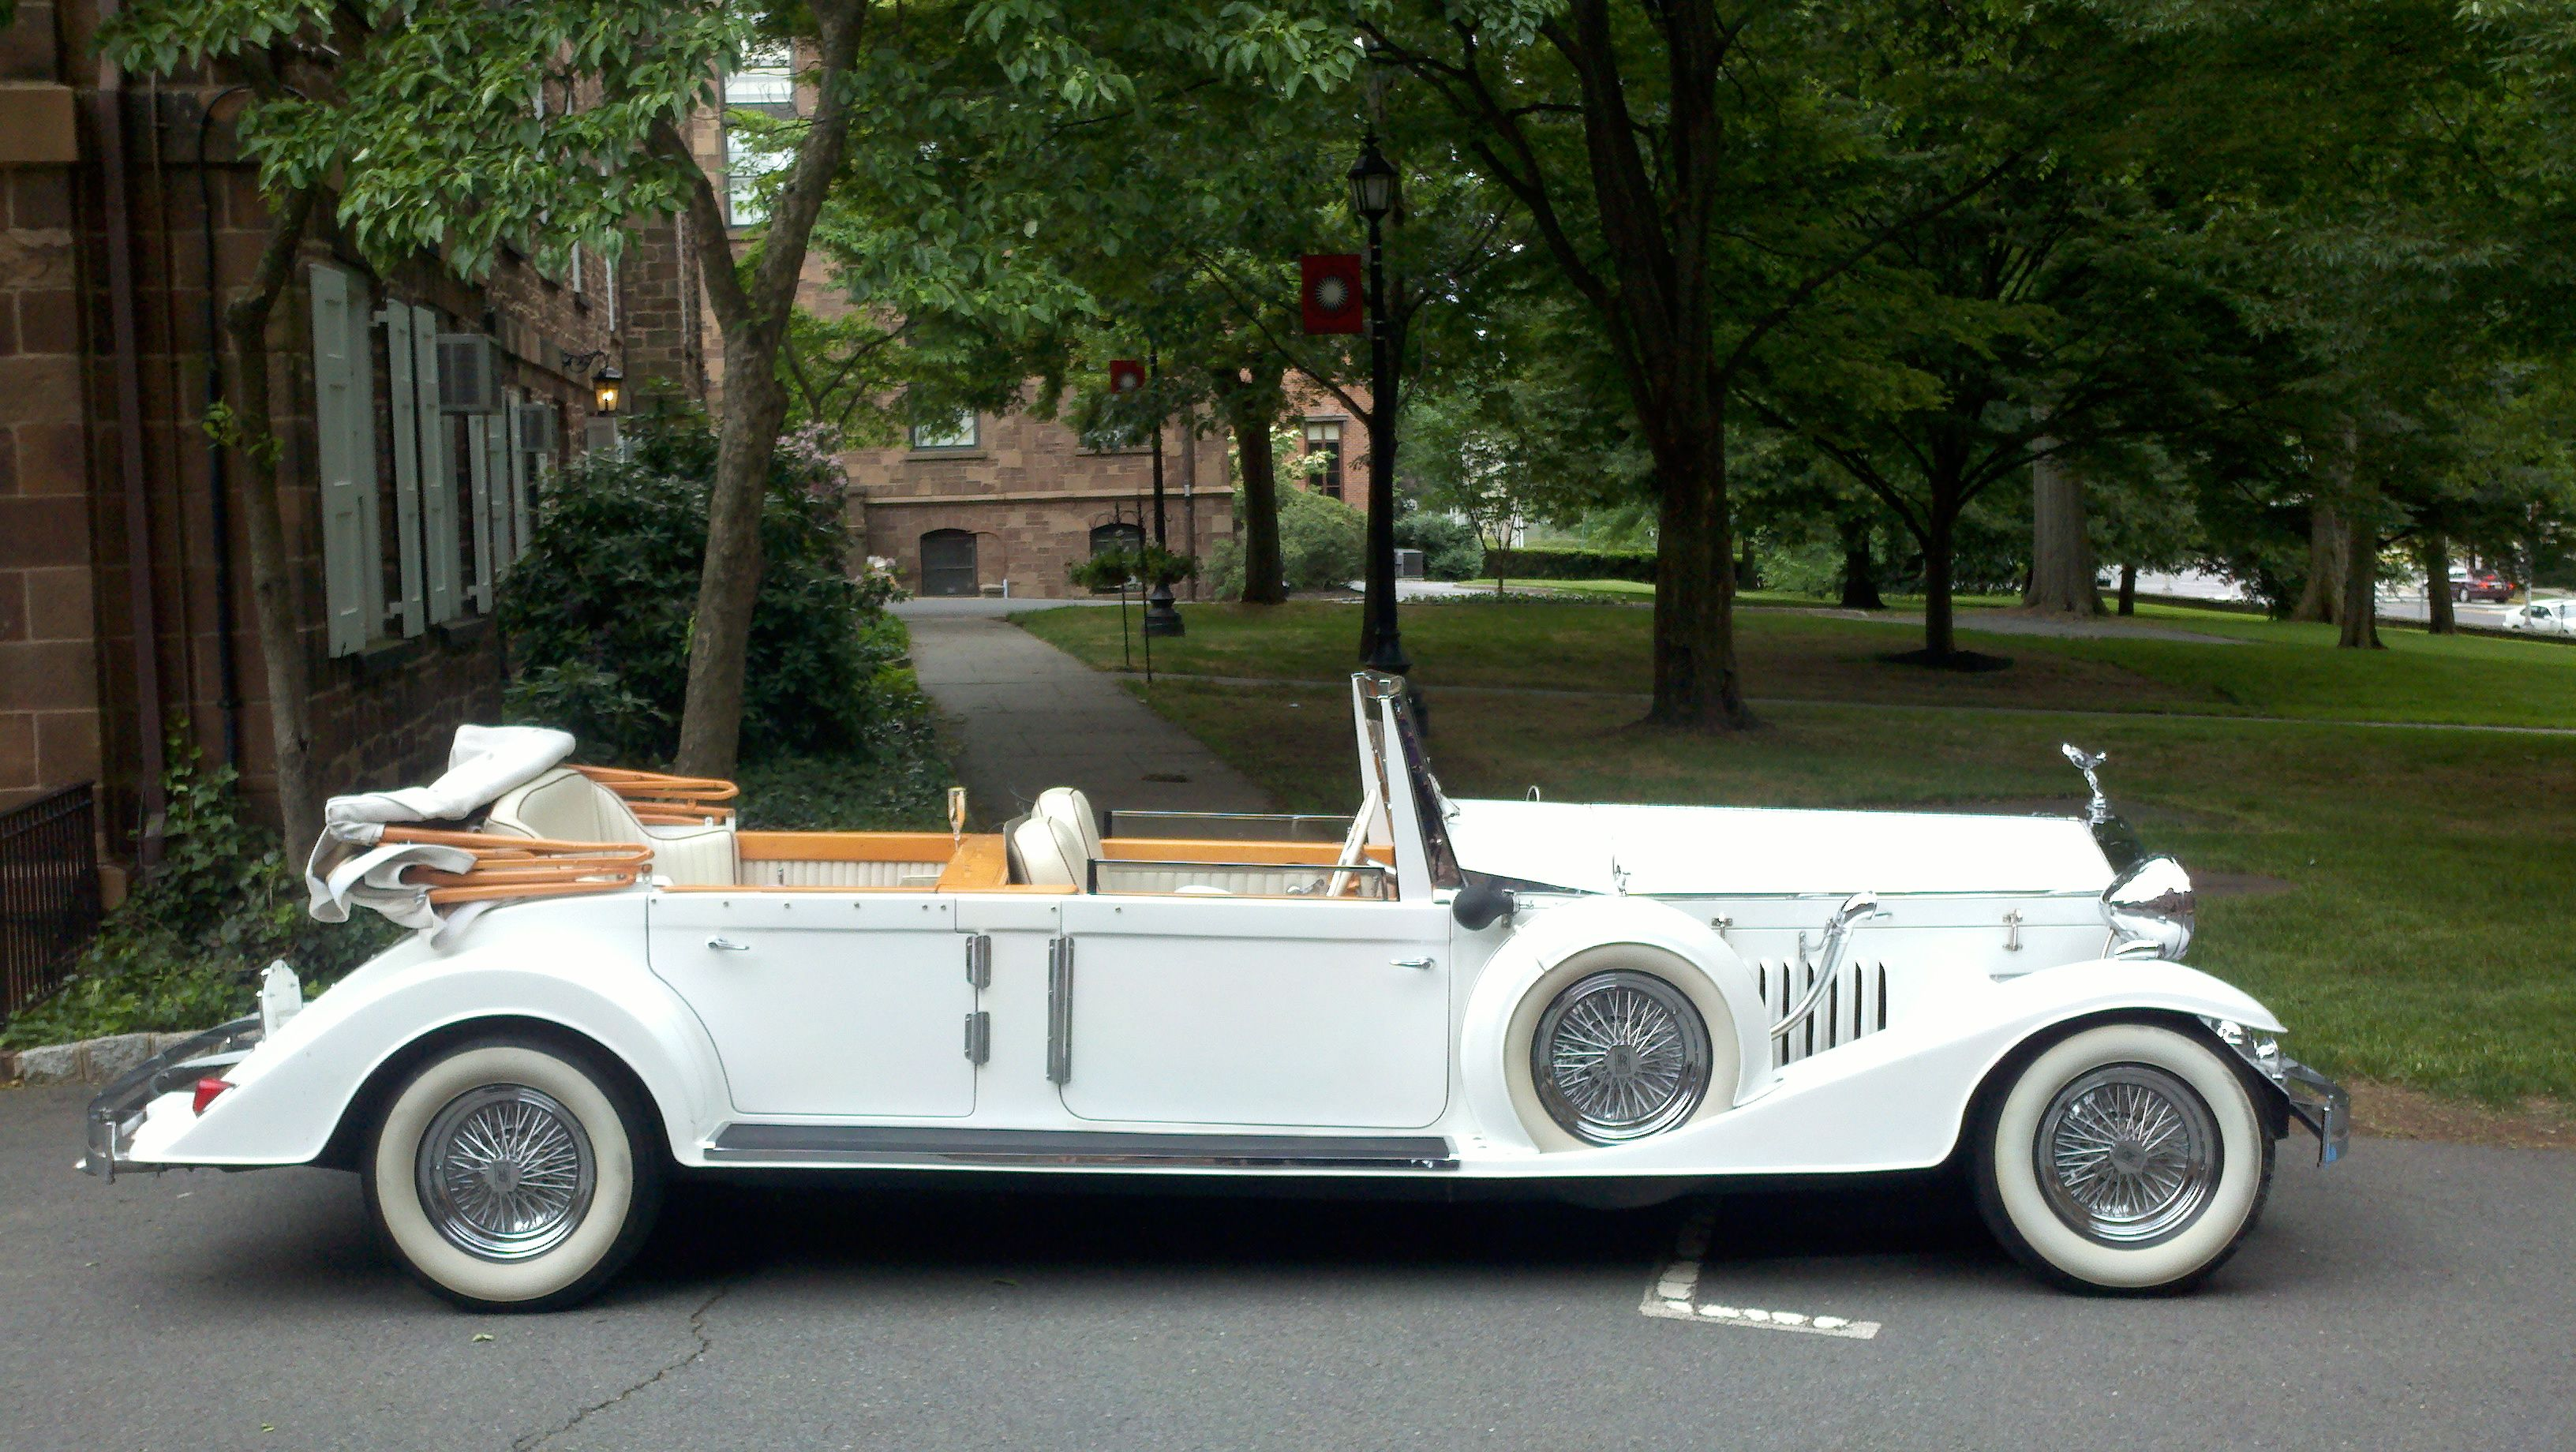 Cool Ride Antique Car Rolls Royce Phantom Rolls Royce And Rolls